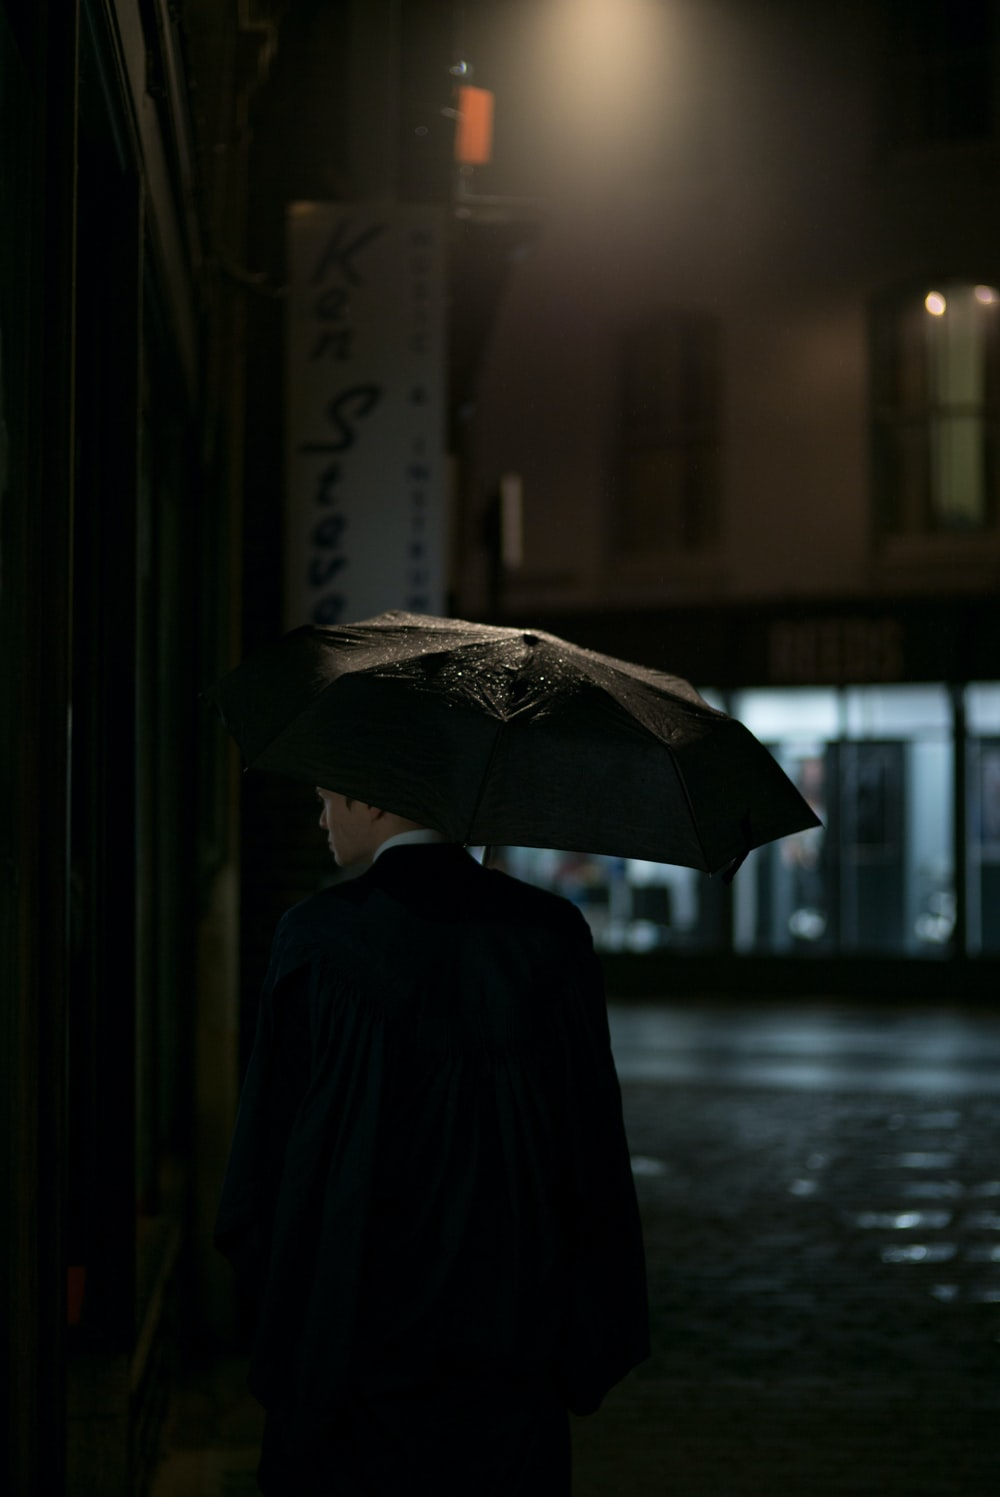 man in black suit jacket under umbrella